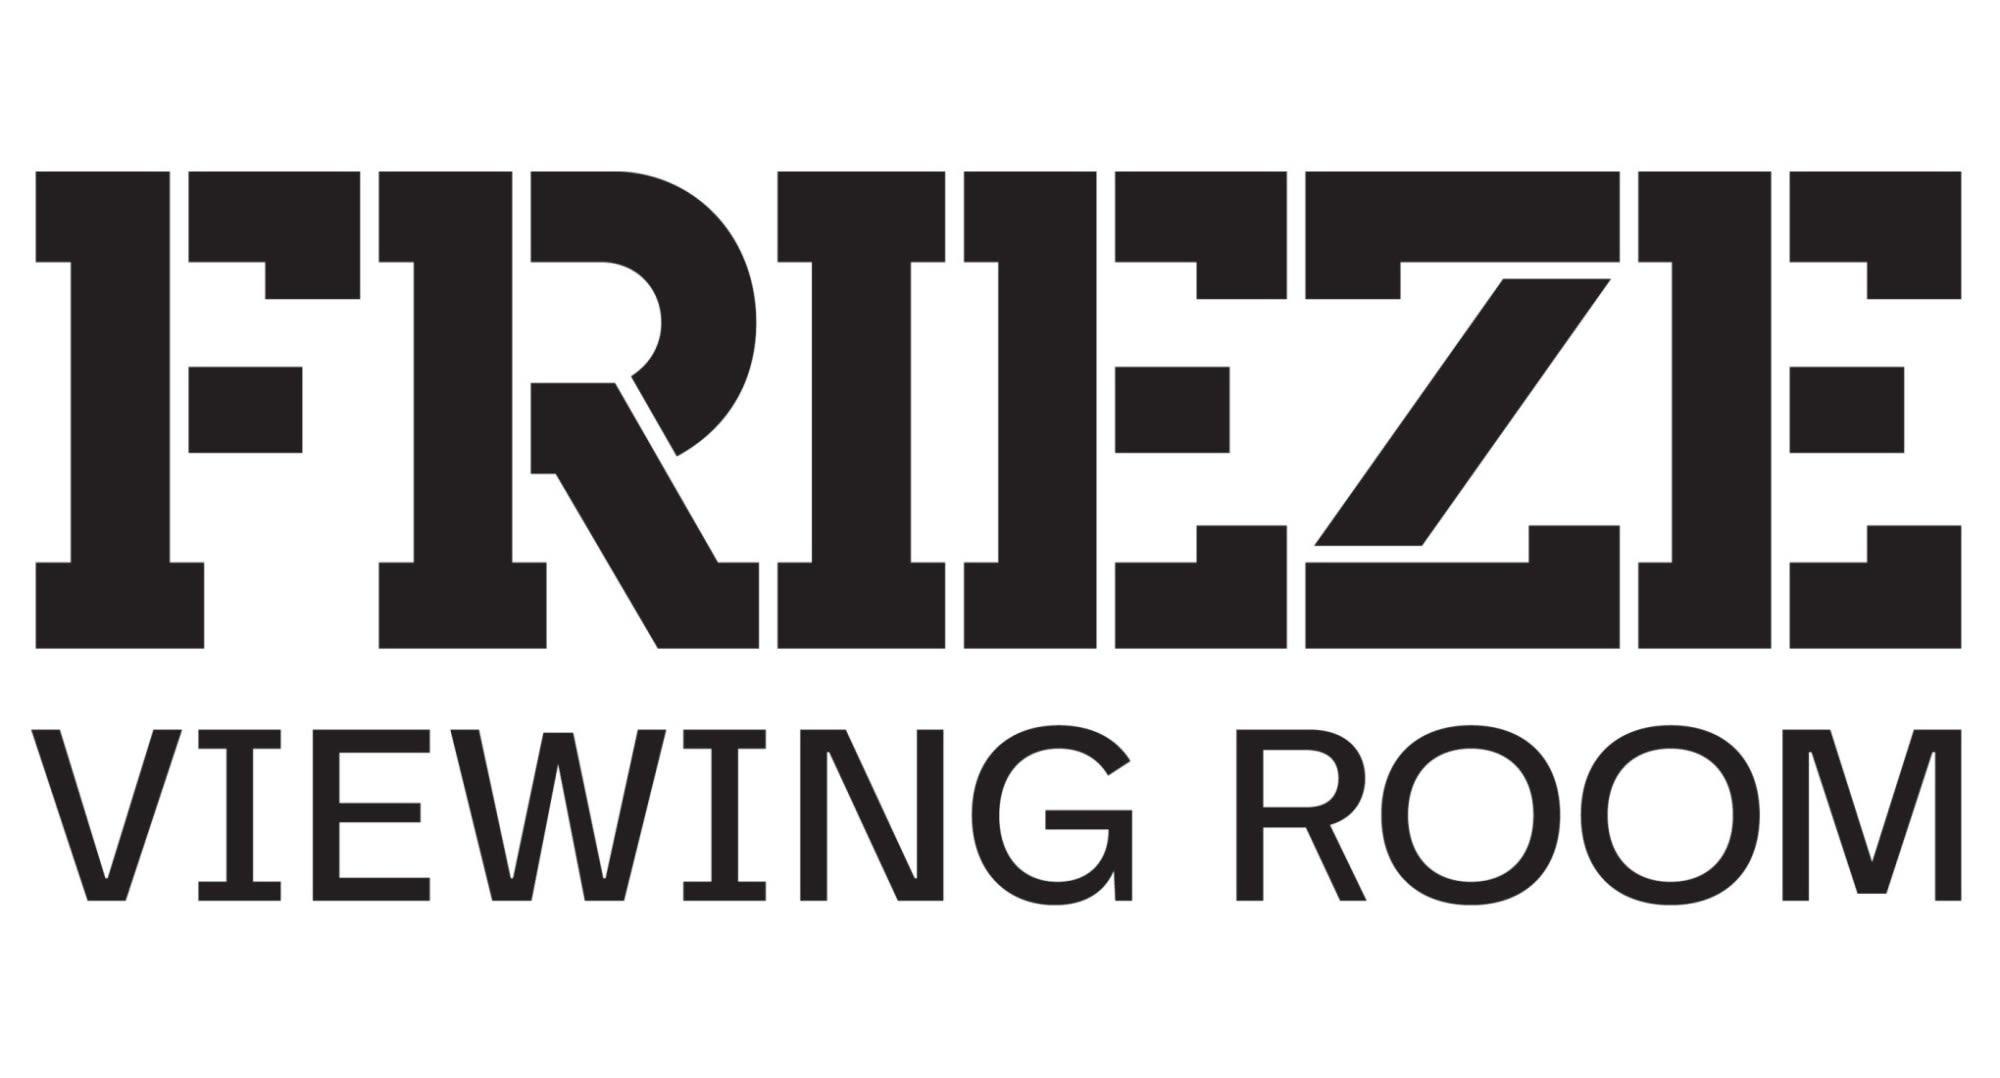 Frieze viewing room logo